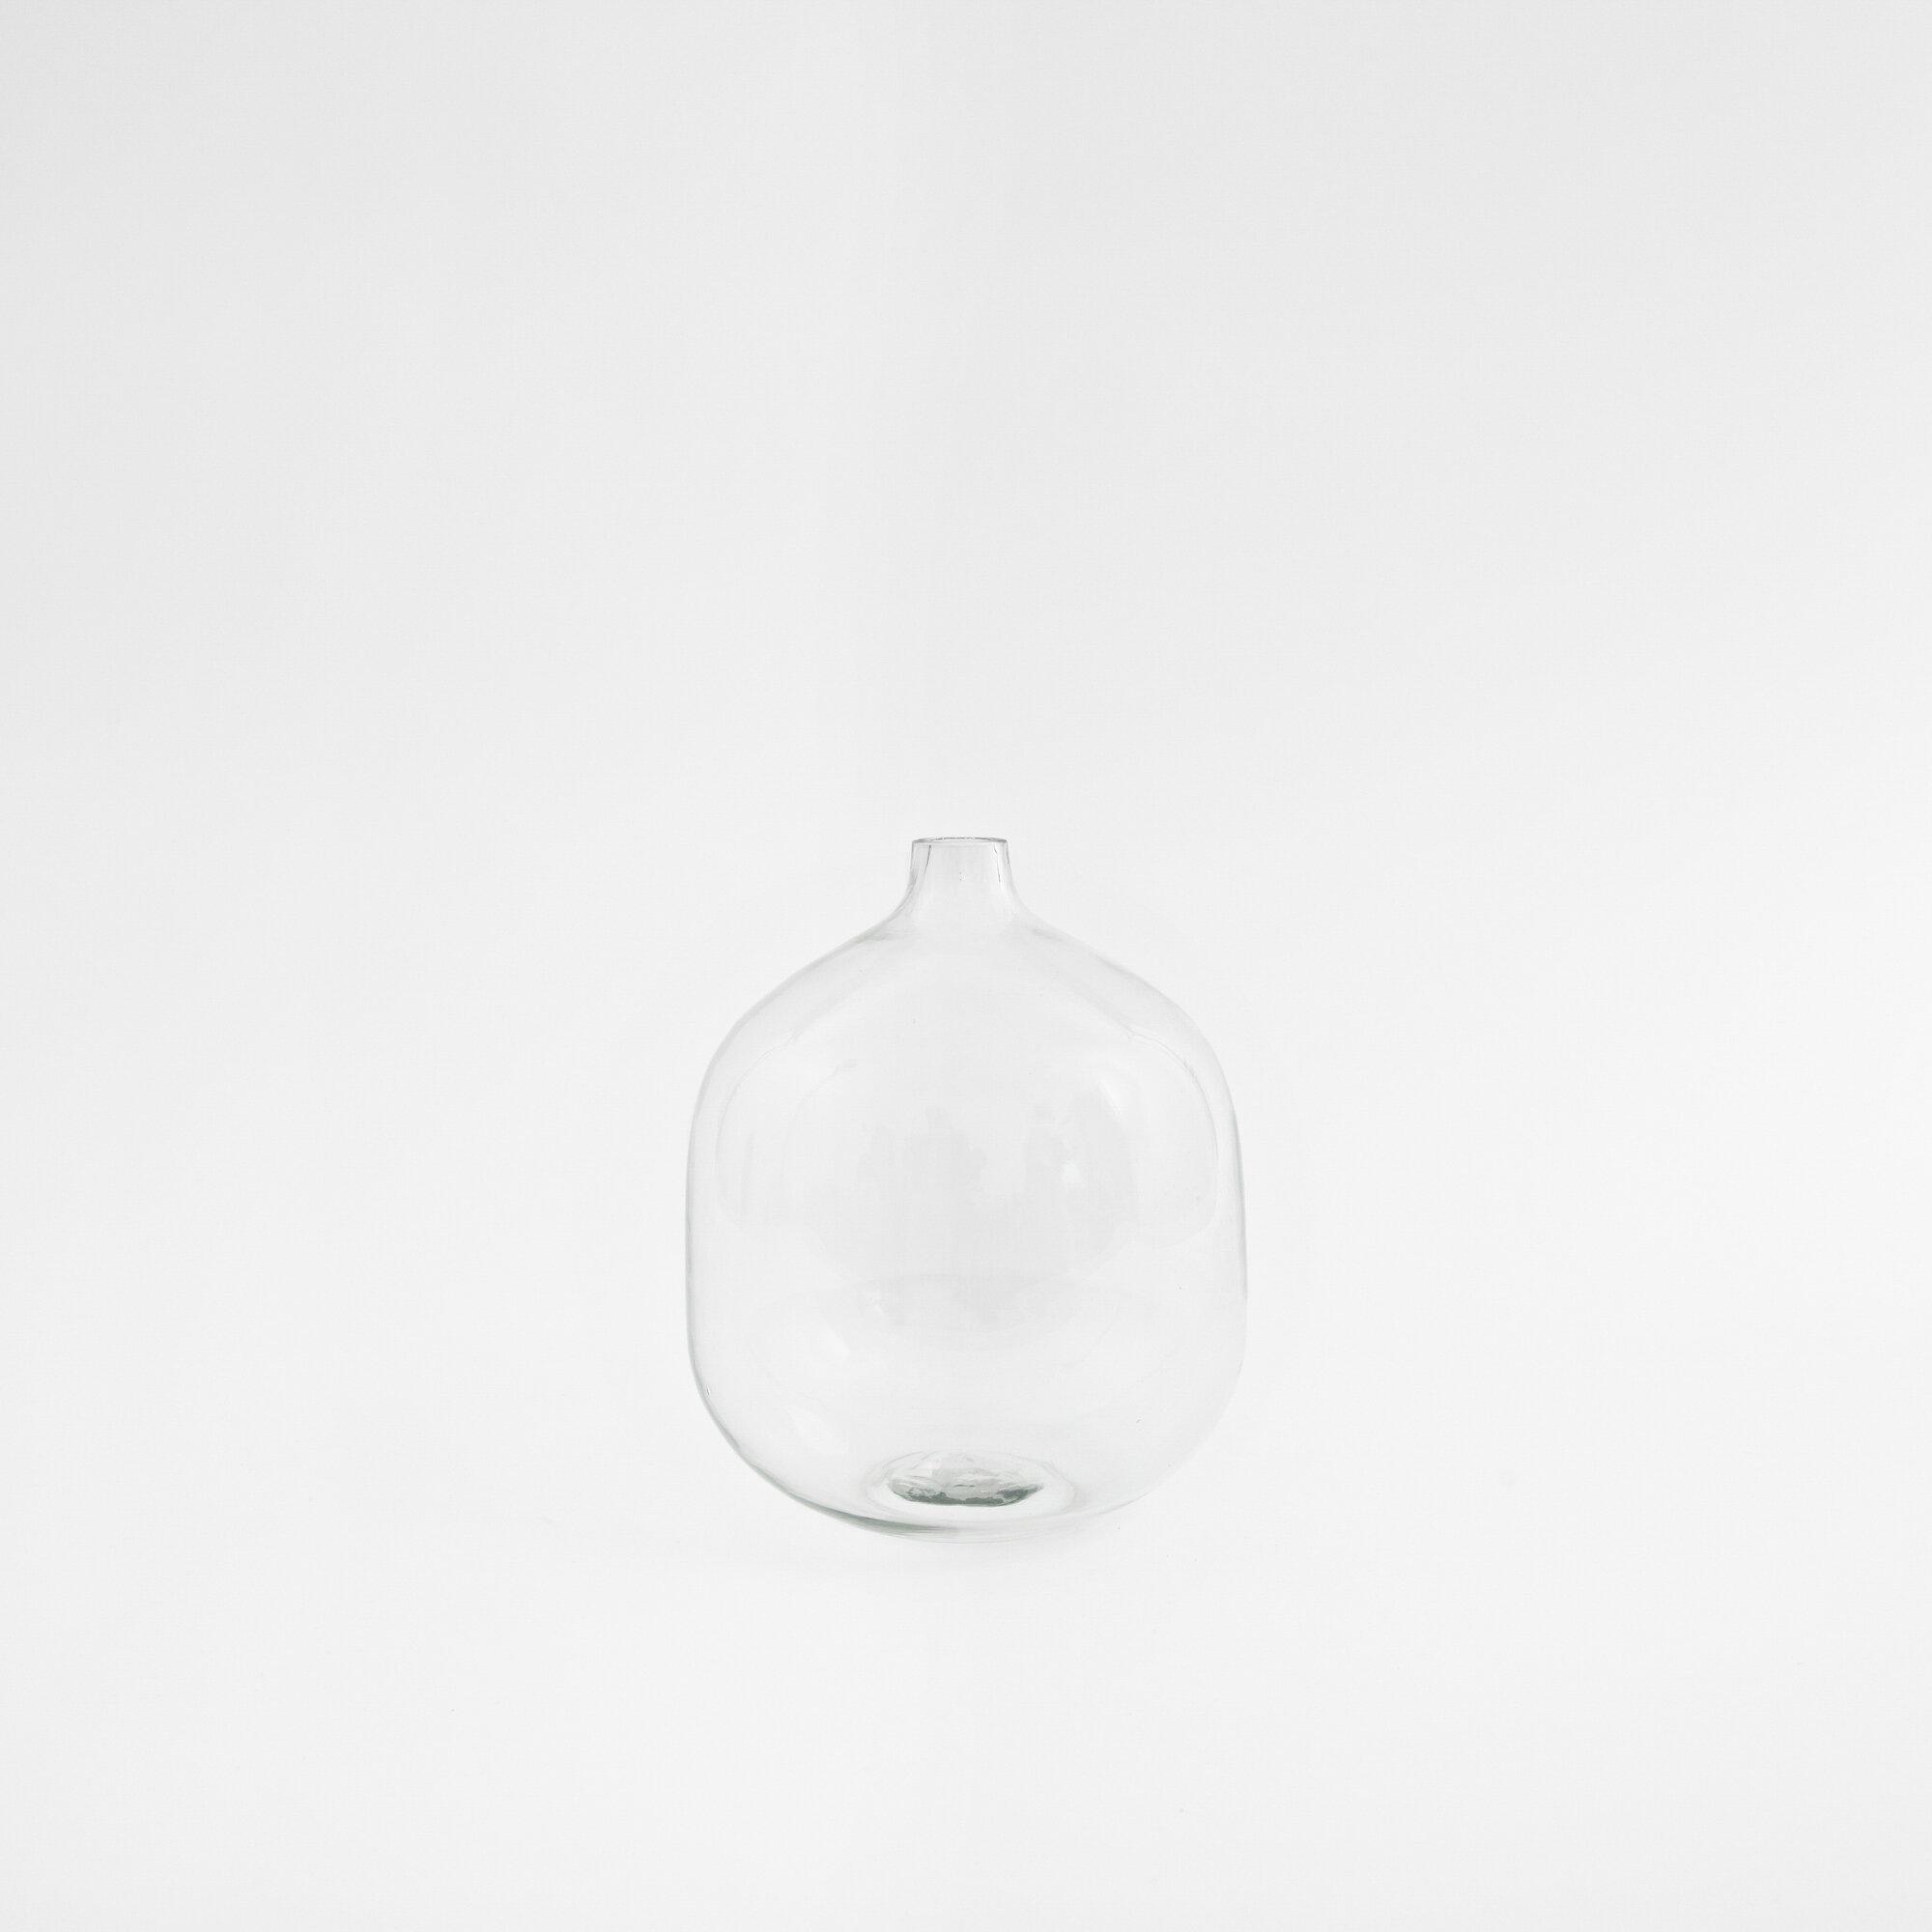 05-shop-mayker--home-gifting-design-decor-nashville-home-accents-vases-web-res.jpg